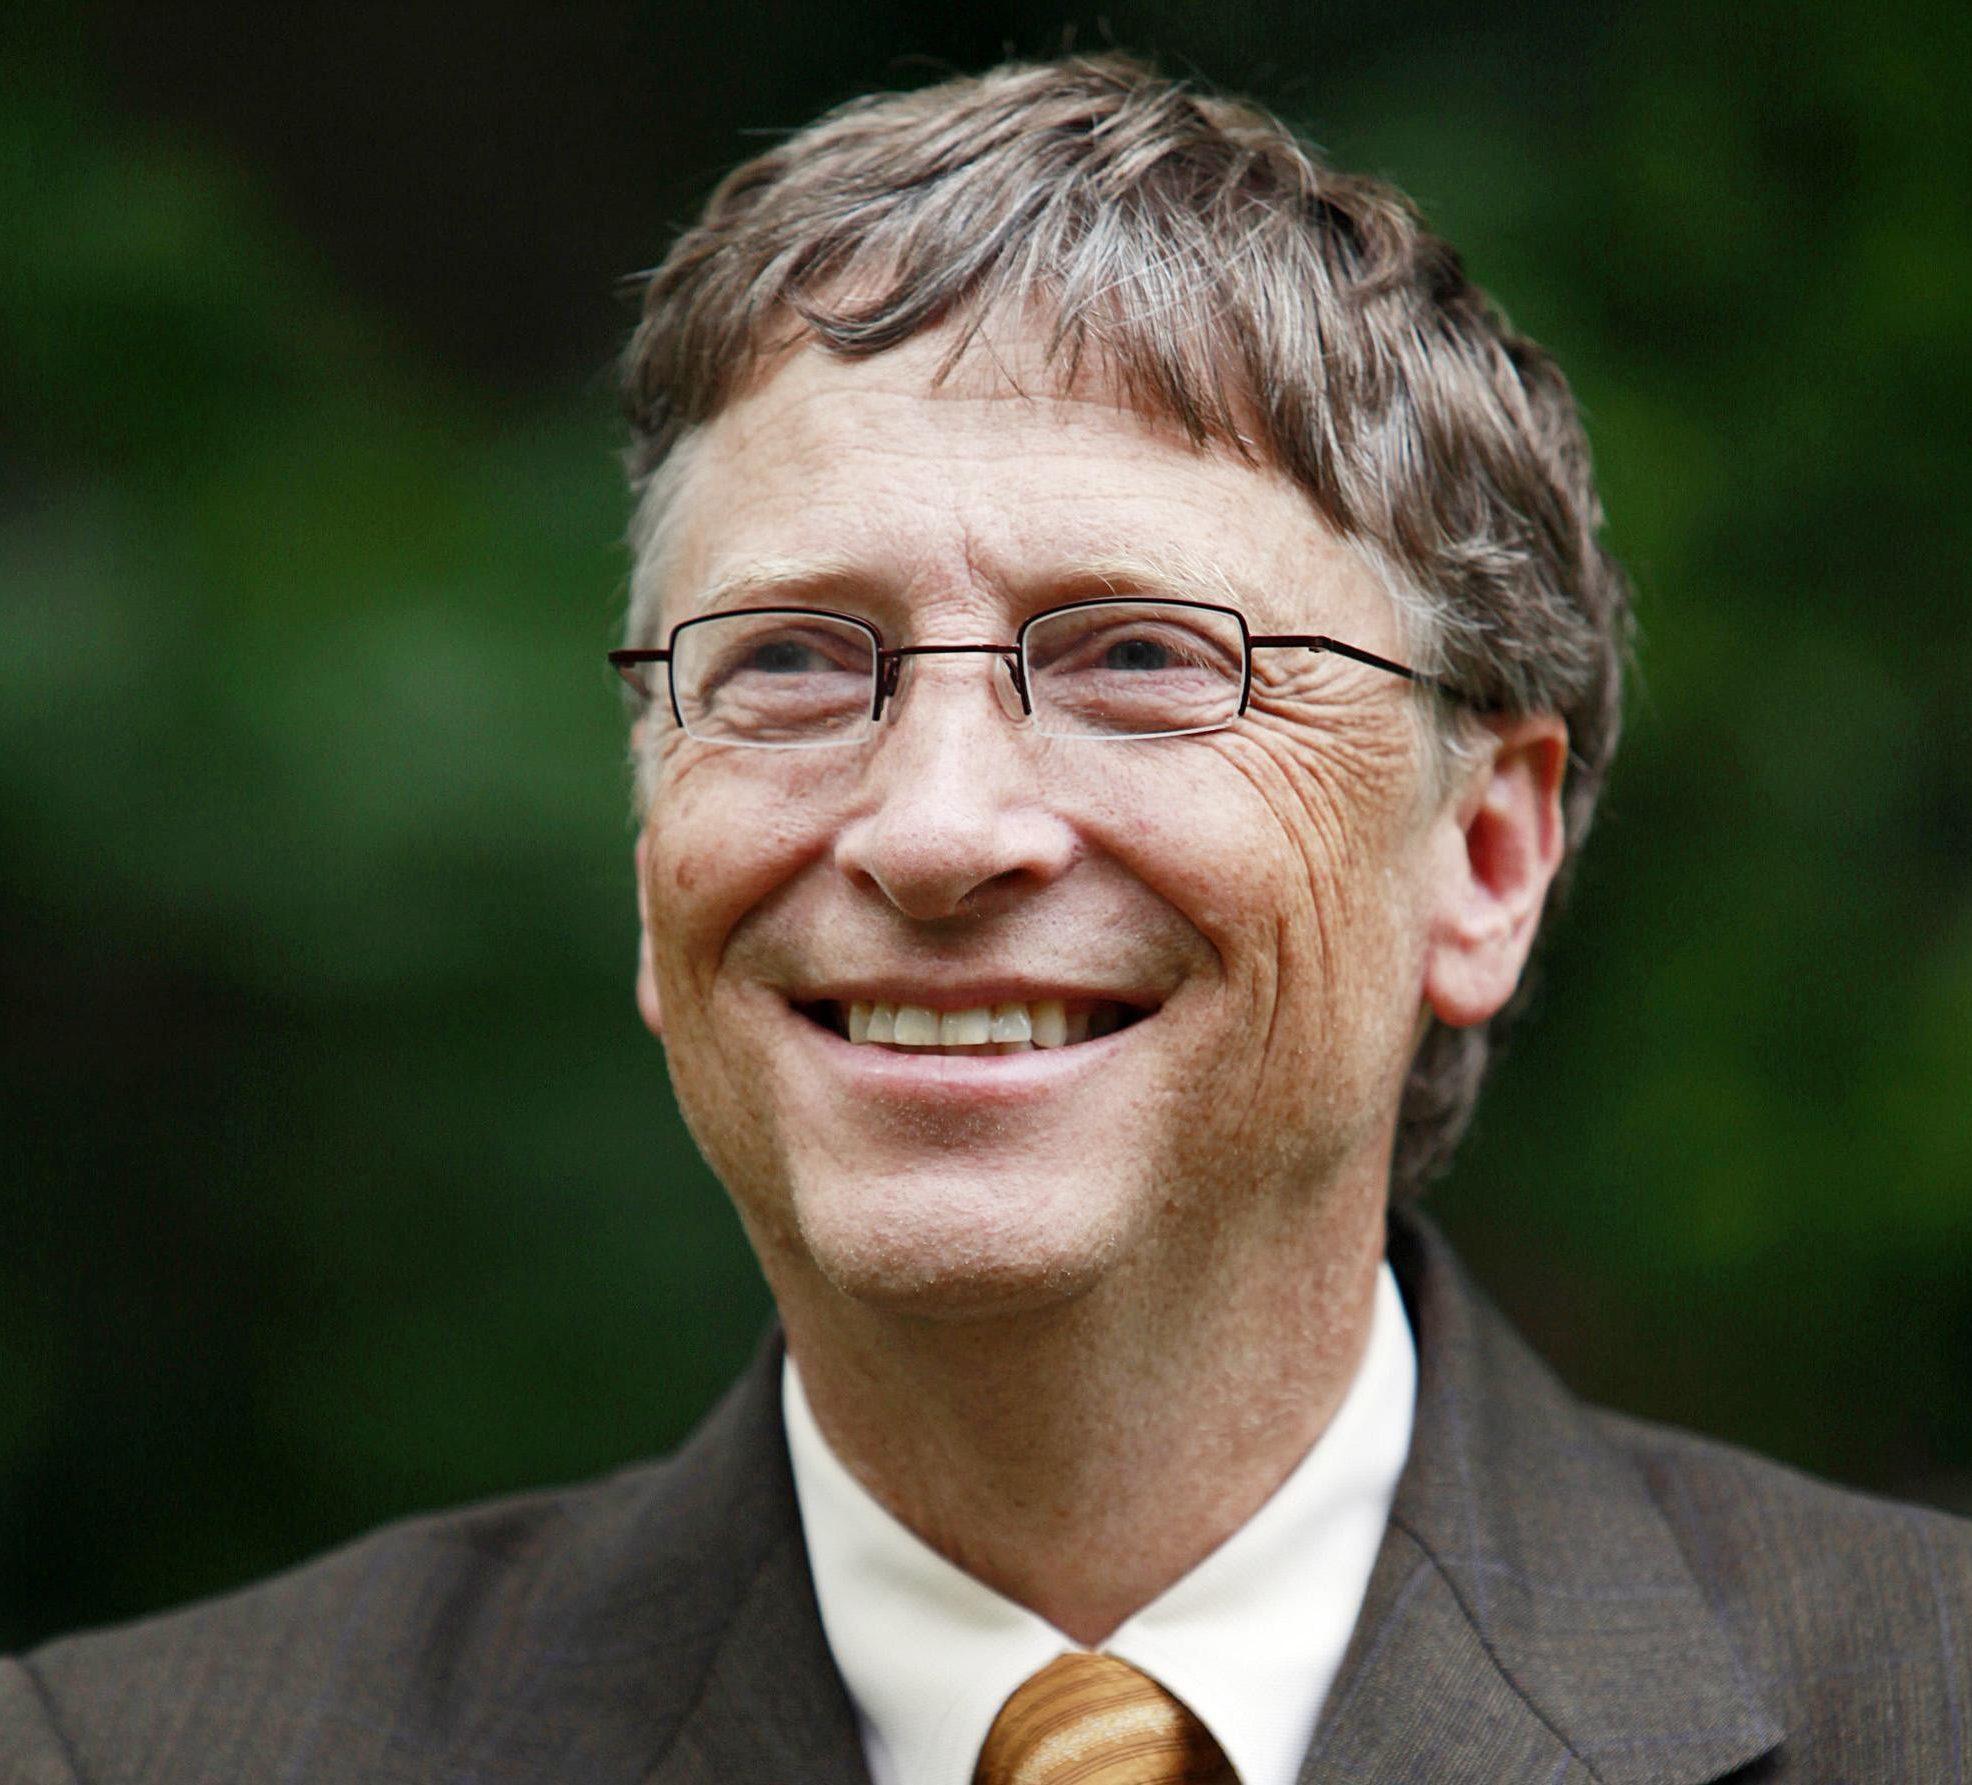 Bill Gates will visit Edinburgh University on Friday (Jason Alden/PA Wire)